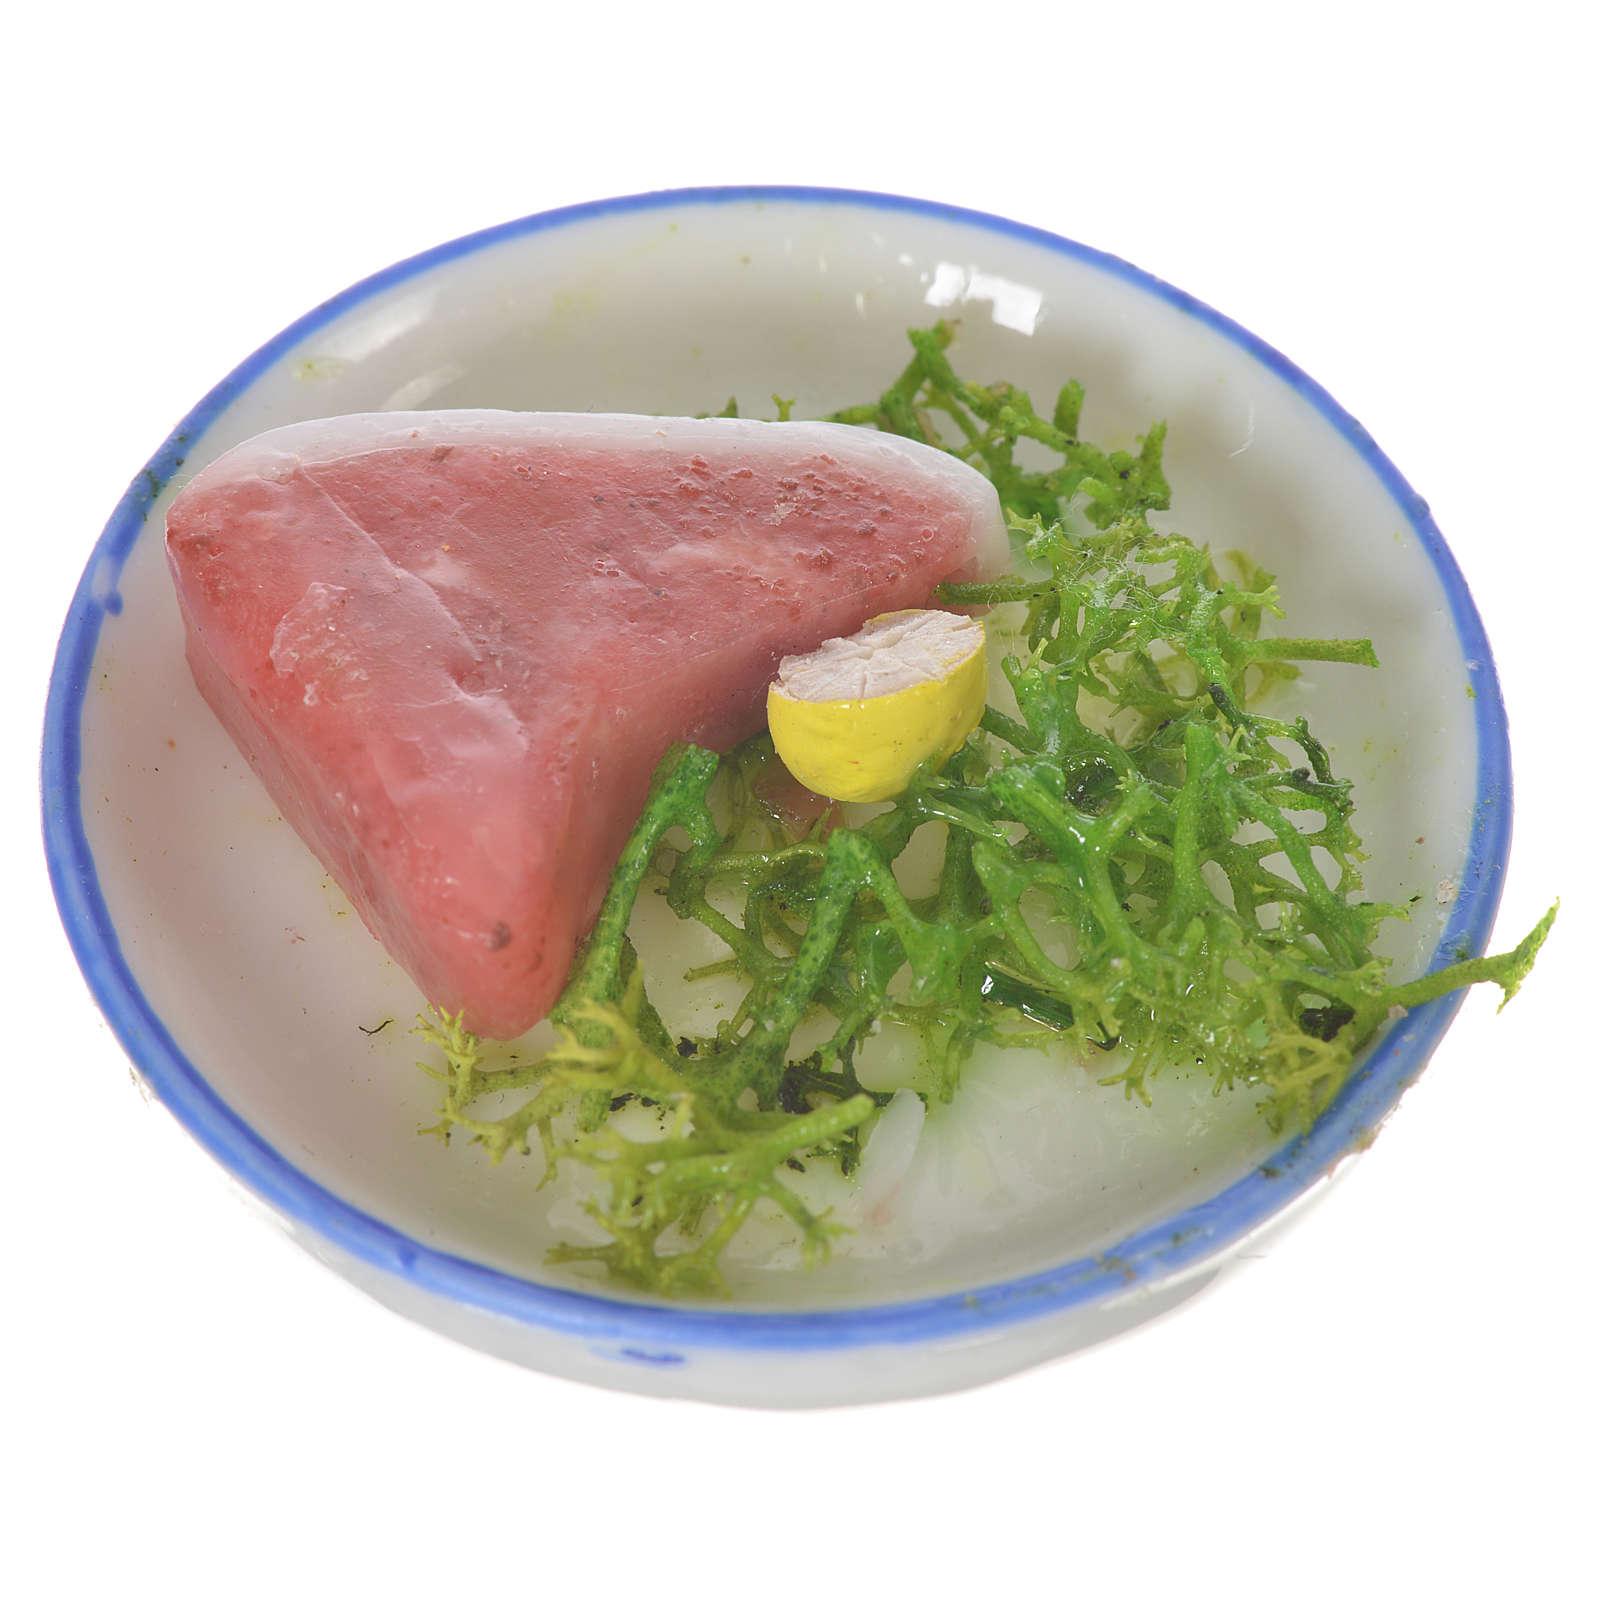 Piatto carne insalata in cera per figure 20-24 cm 4